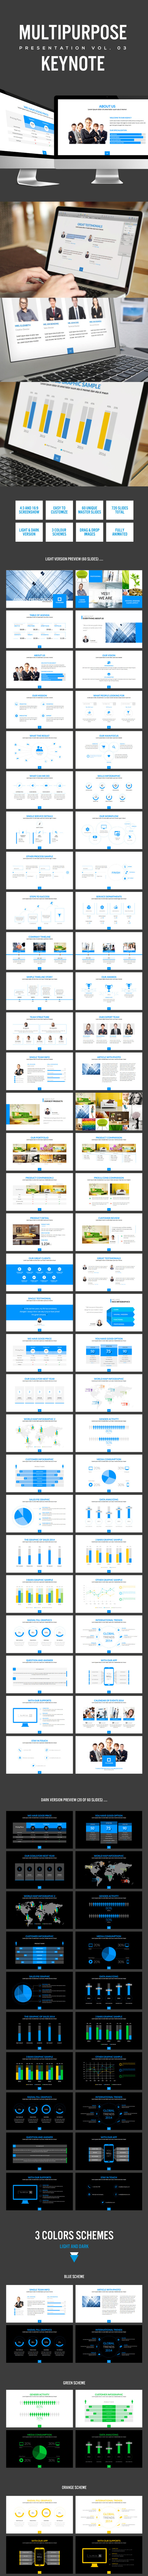 Multipurpose Keynote Presentation (Vol. 03) - Keynote Templates Presentation Templates